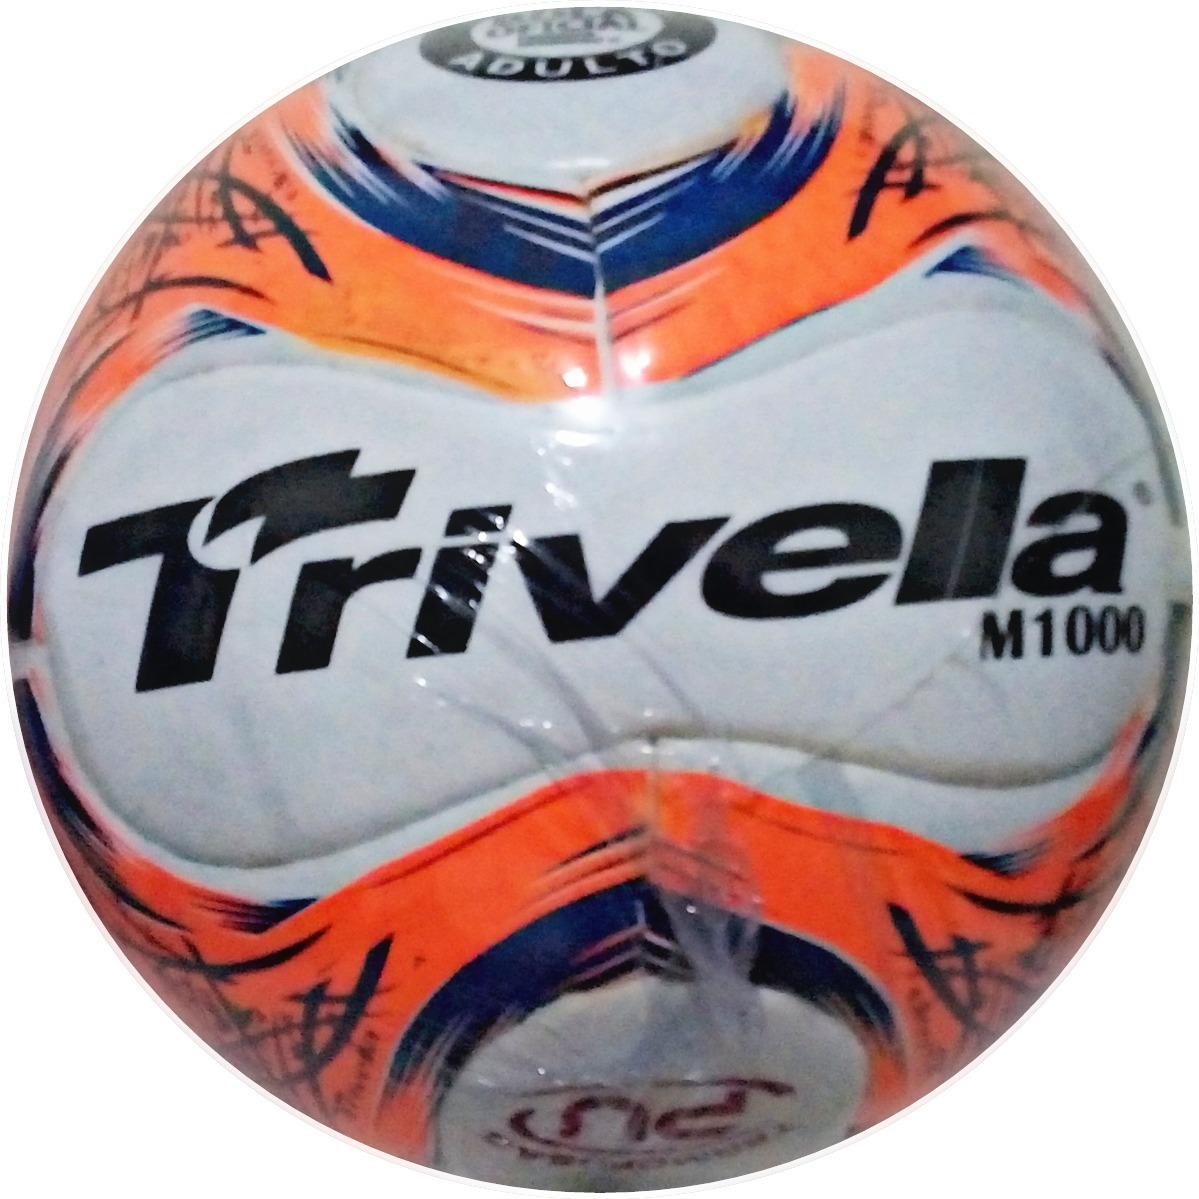 b80508362 Kit 2 Bolas De Futsal Trivella Original - Brasil Gold - R$ 116,00 em ...